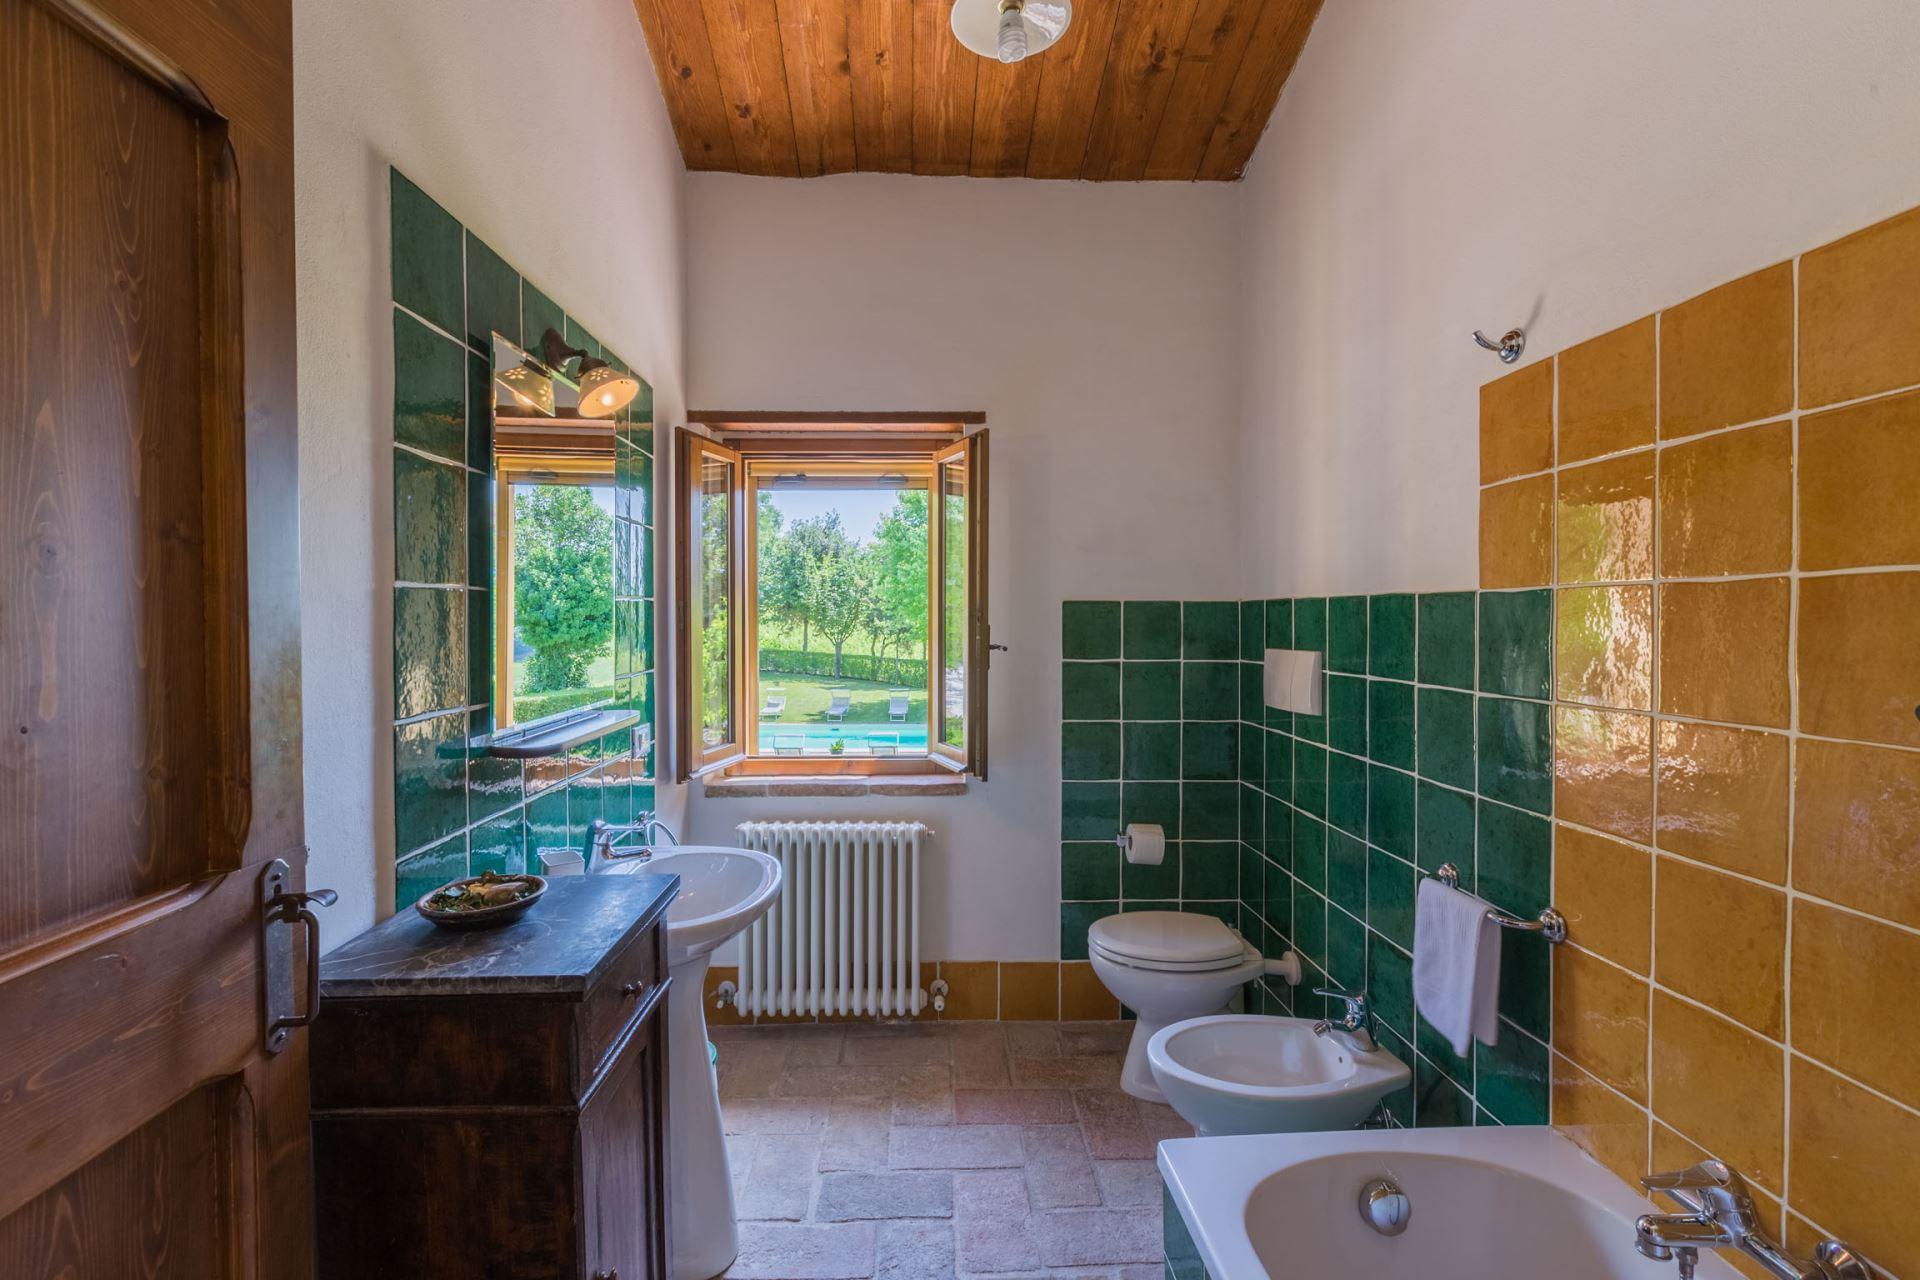 Ferienhaus VILLA DELLE VIGNE (2129909), Pesaro, Pesaro und Urbino, Marken, Italien, Bild 12